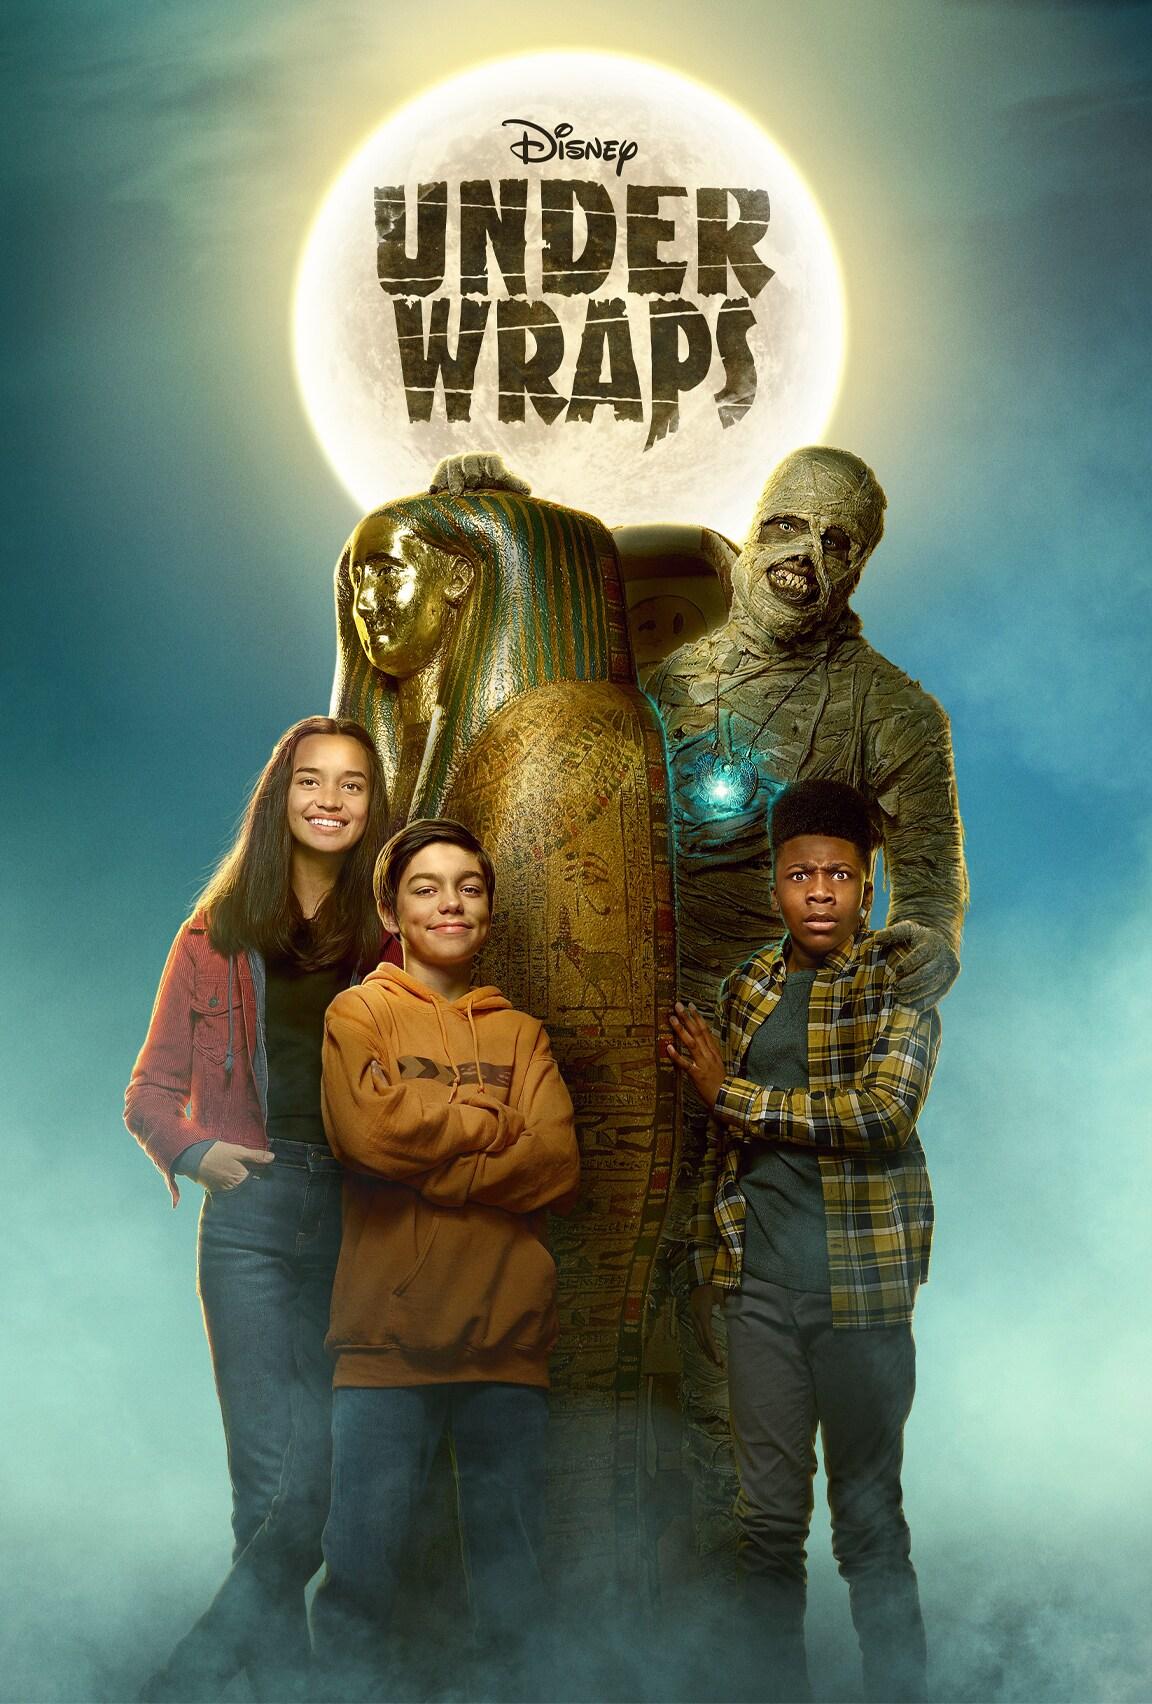 Disney Channel's Under Wraps on Disney Plus